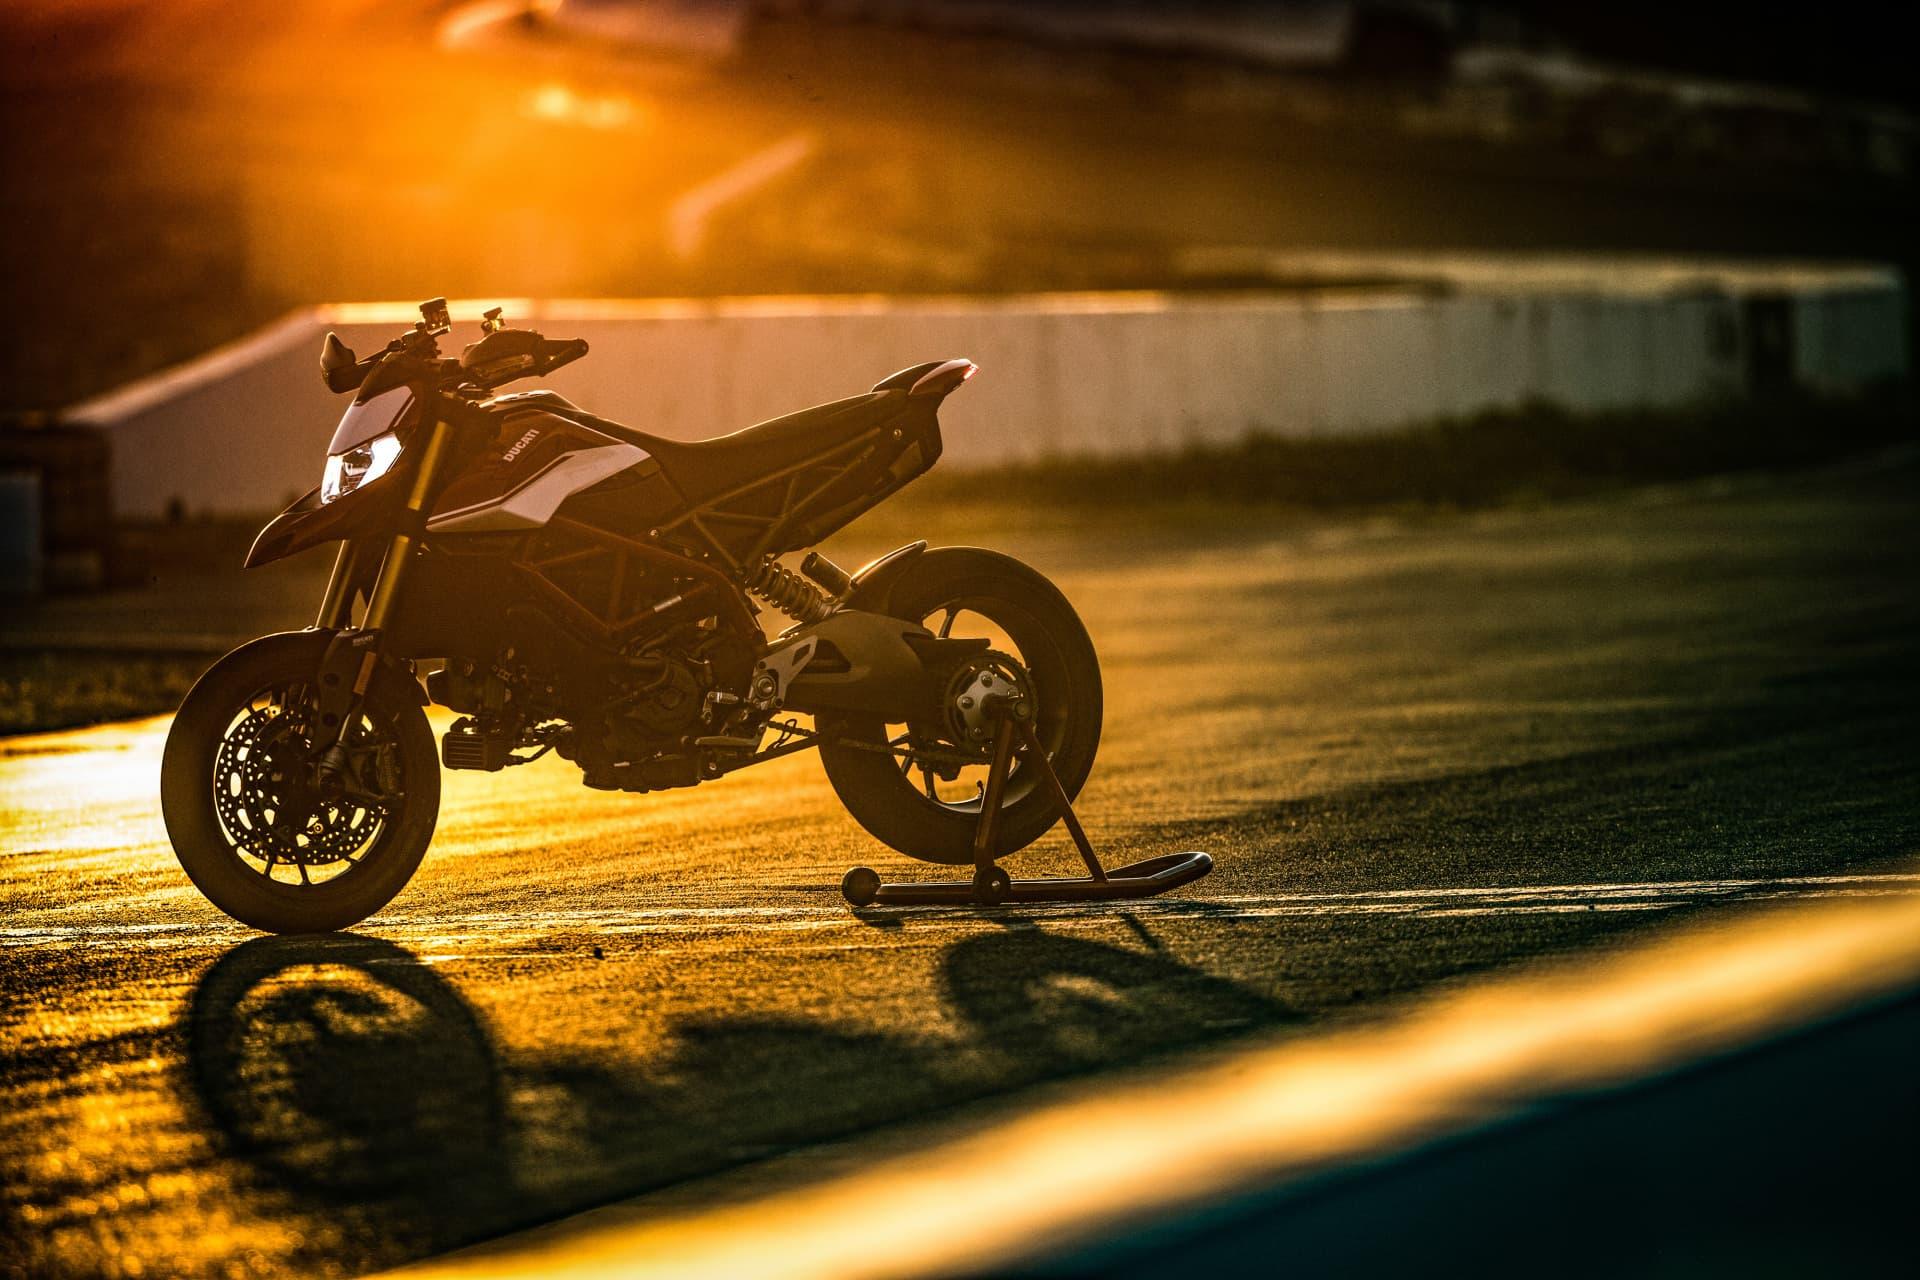 Ducati Hypermotard 950 Sp Static 09 Uc70311 Mid